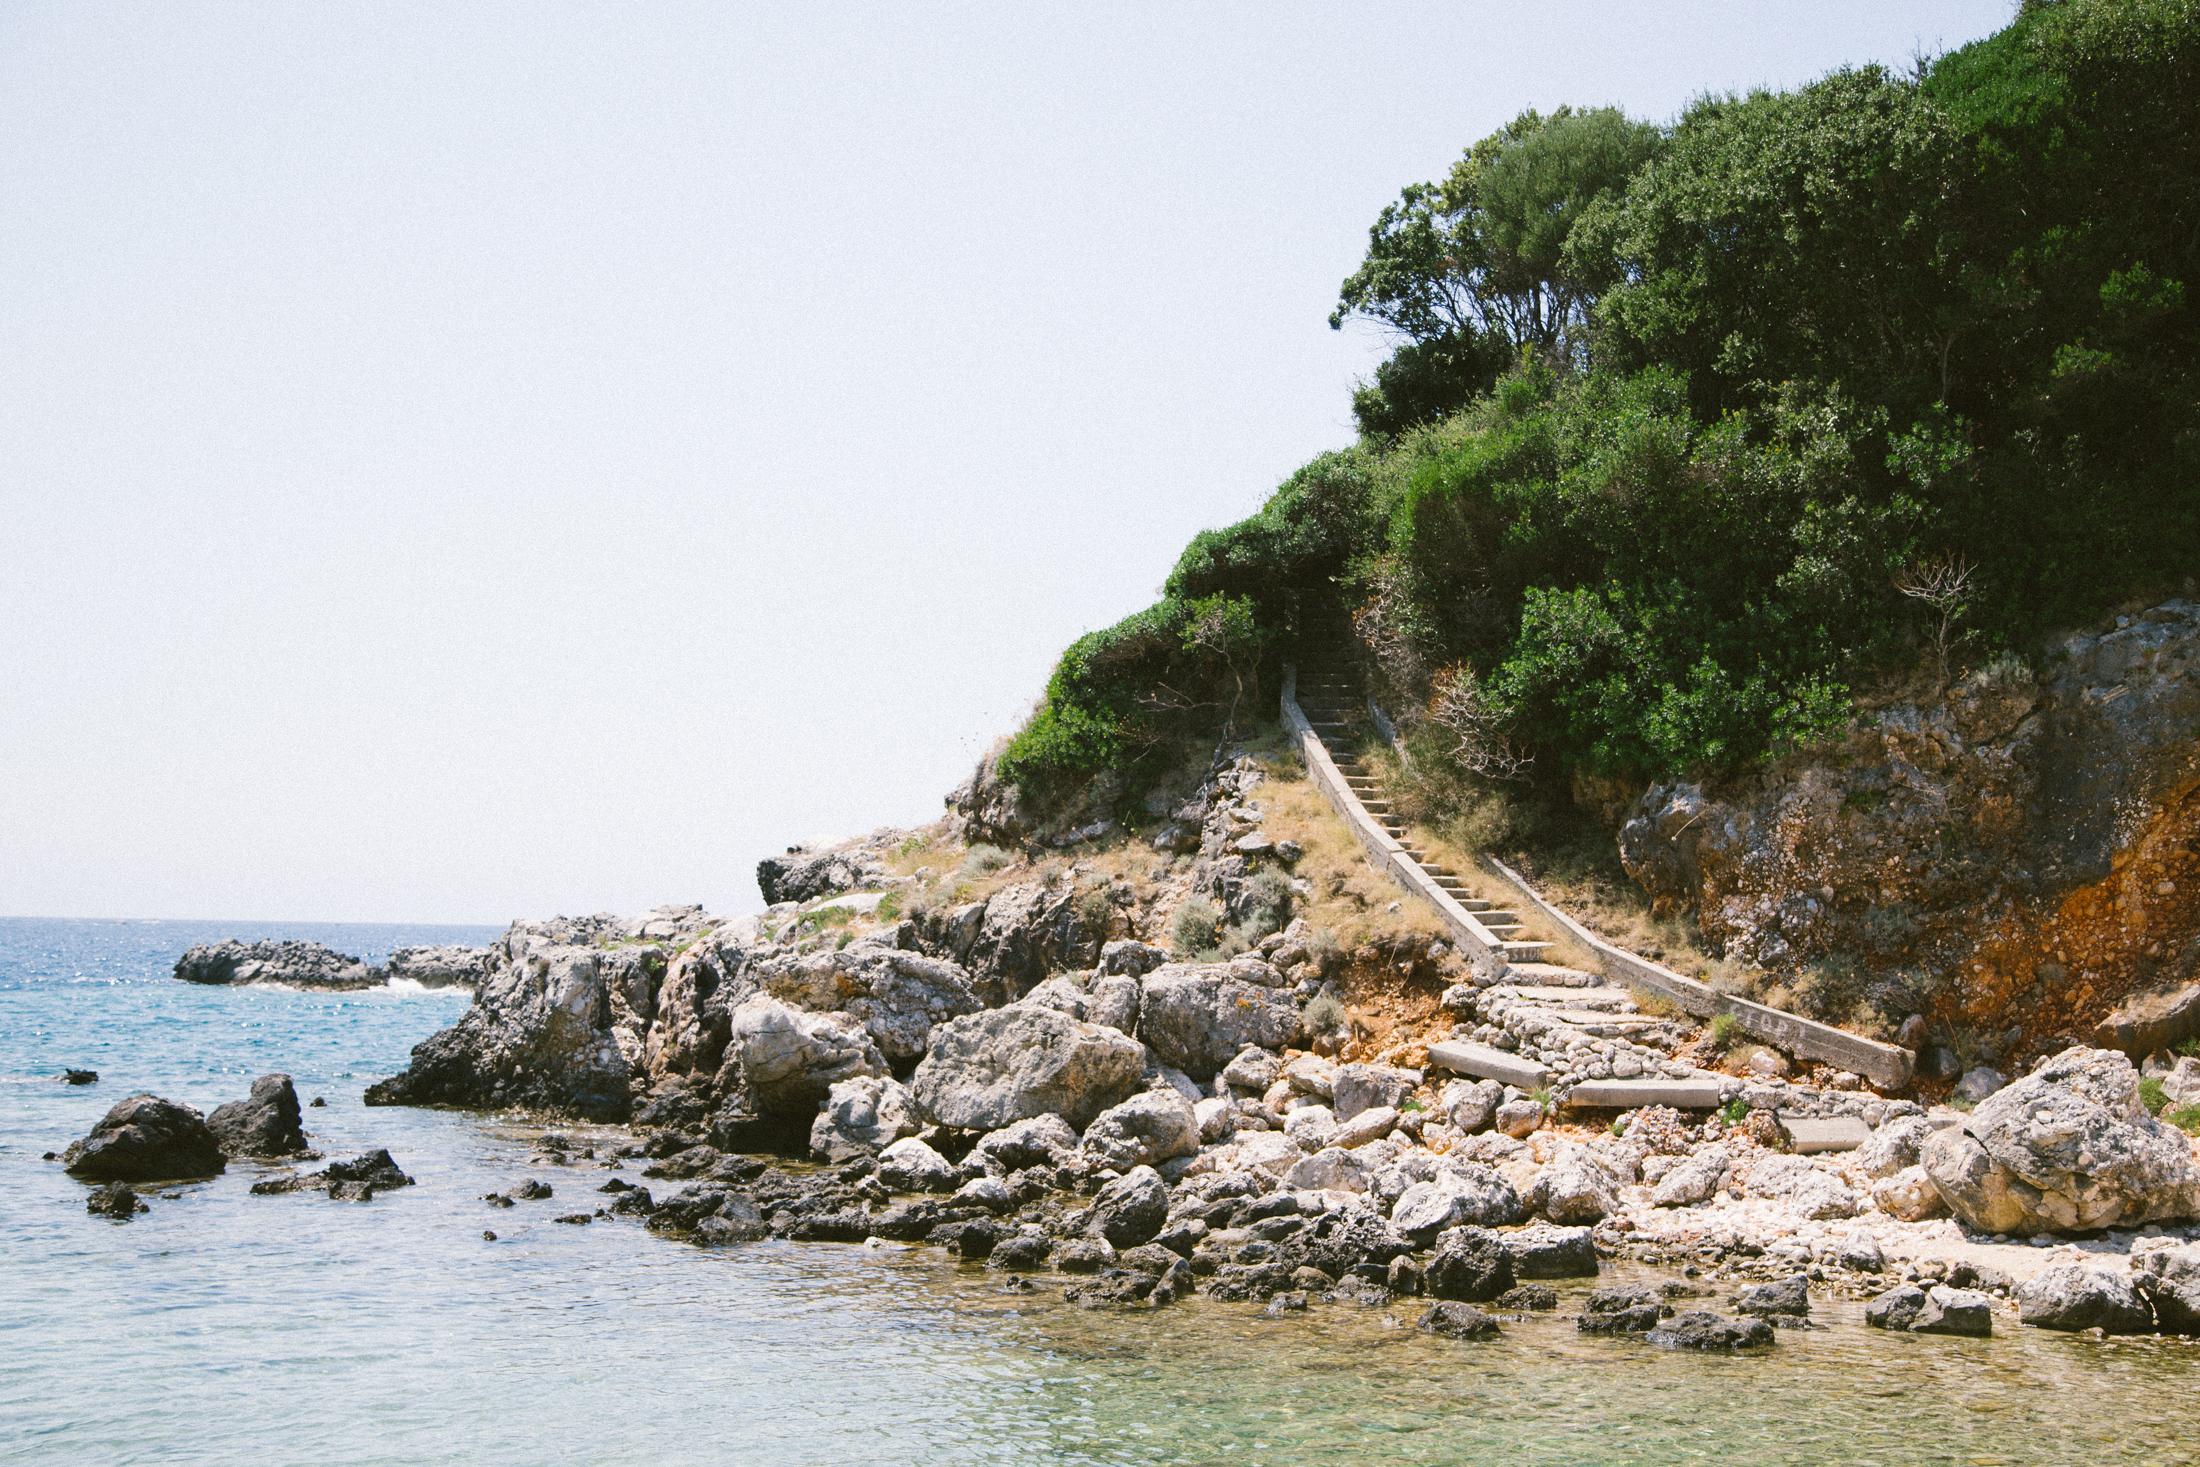 greece-corfu-6381.jpg